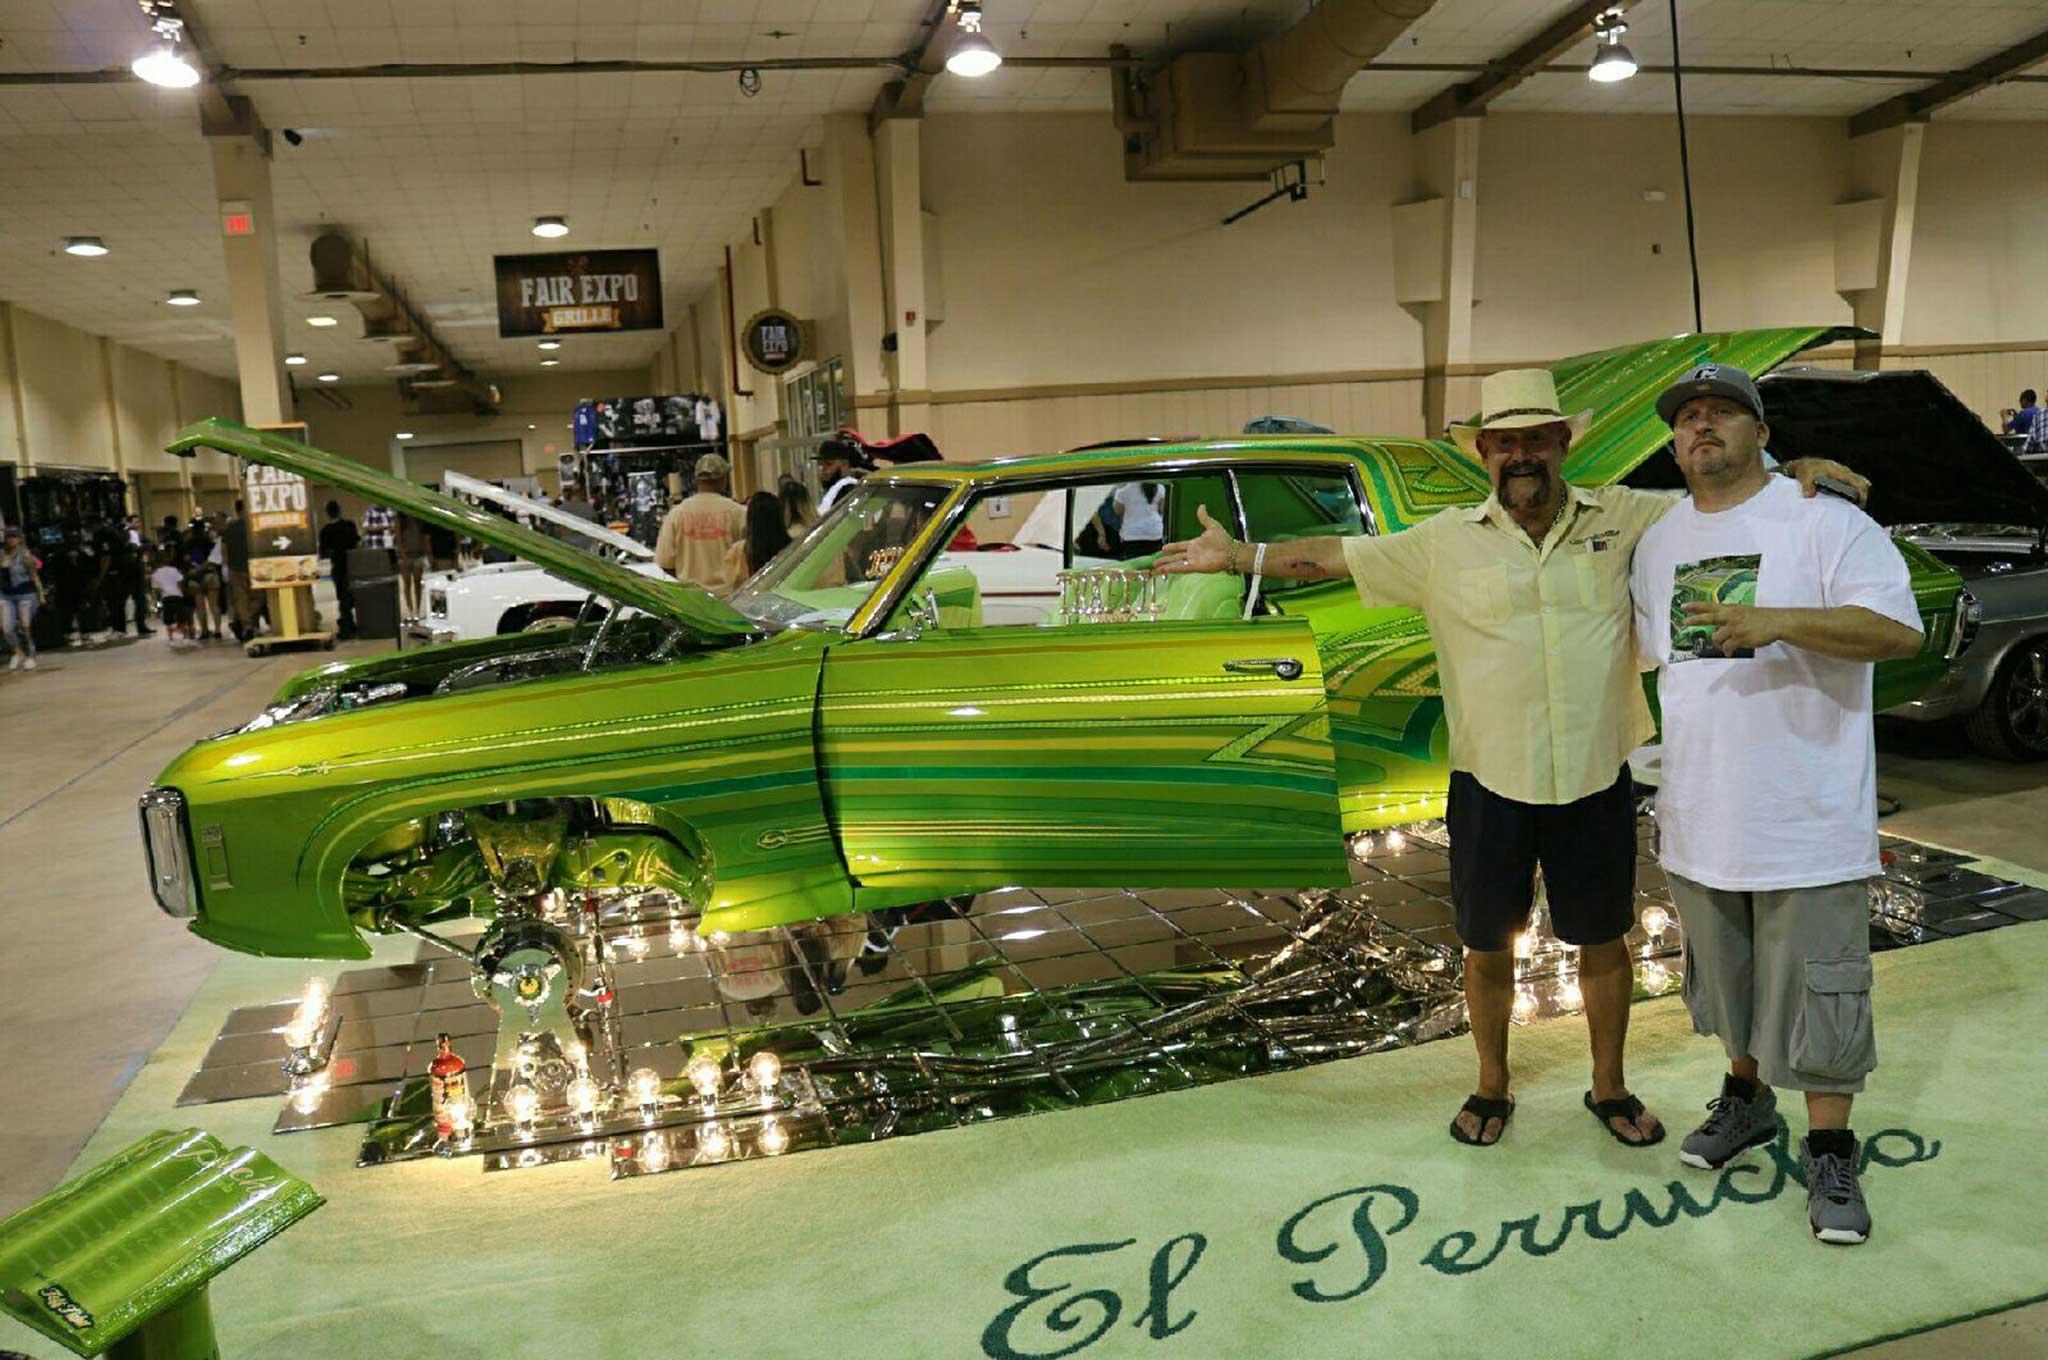 Coast To Coast Chevrolet Impala Miami Lowrider Super Show Ted - South beach classics car show